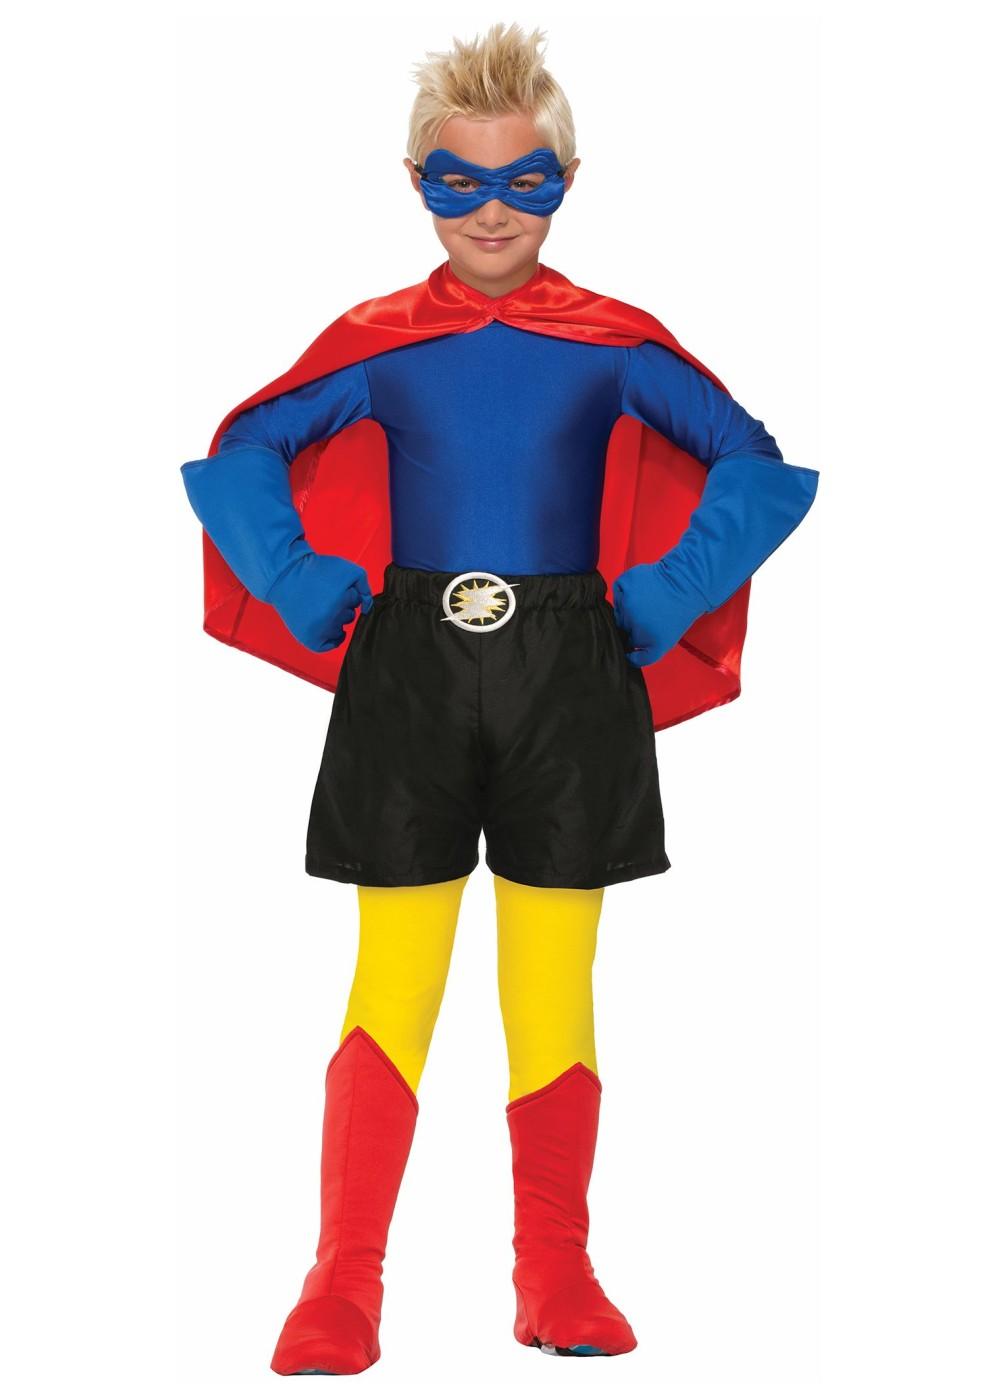 Kid S Superhero Boys Shirt Accessories